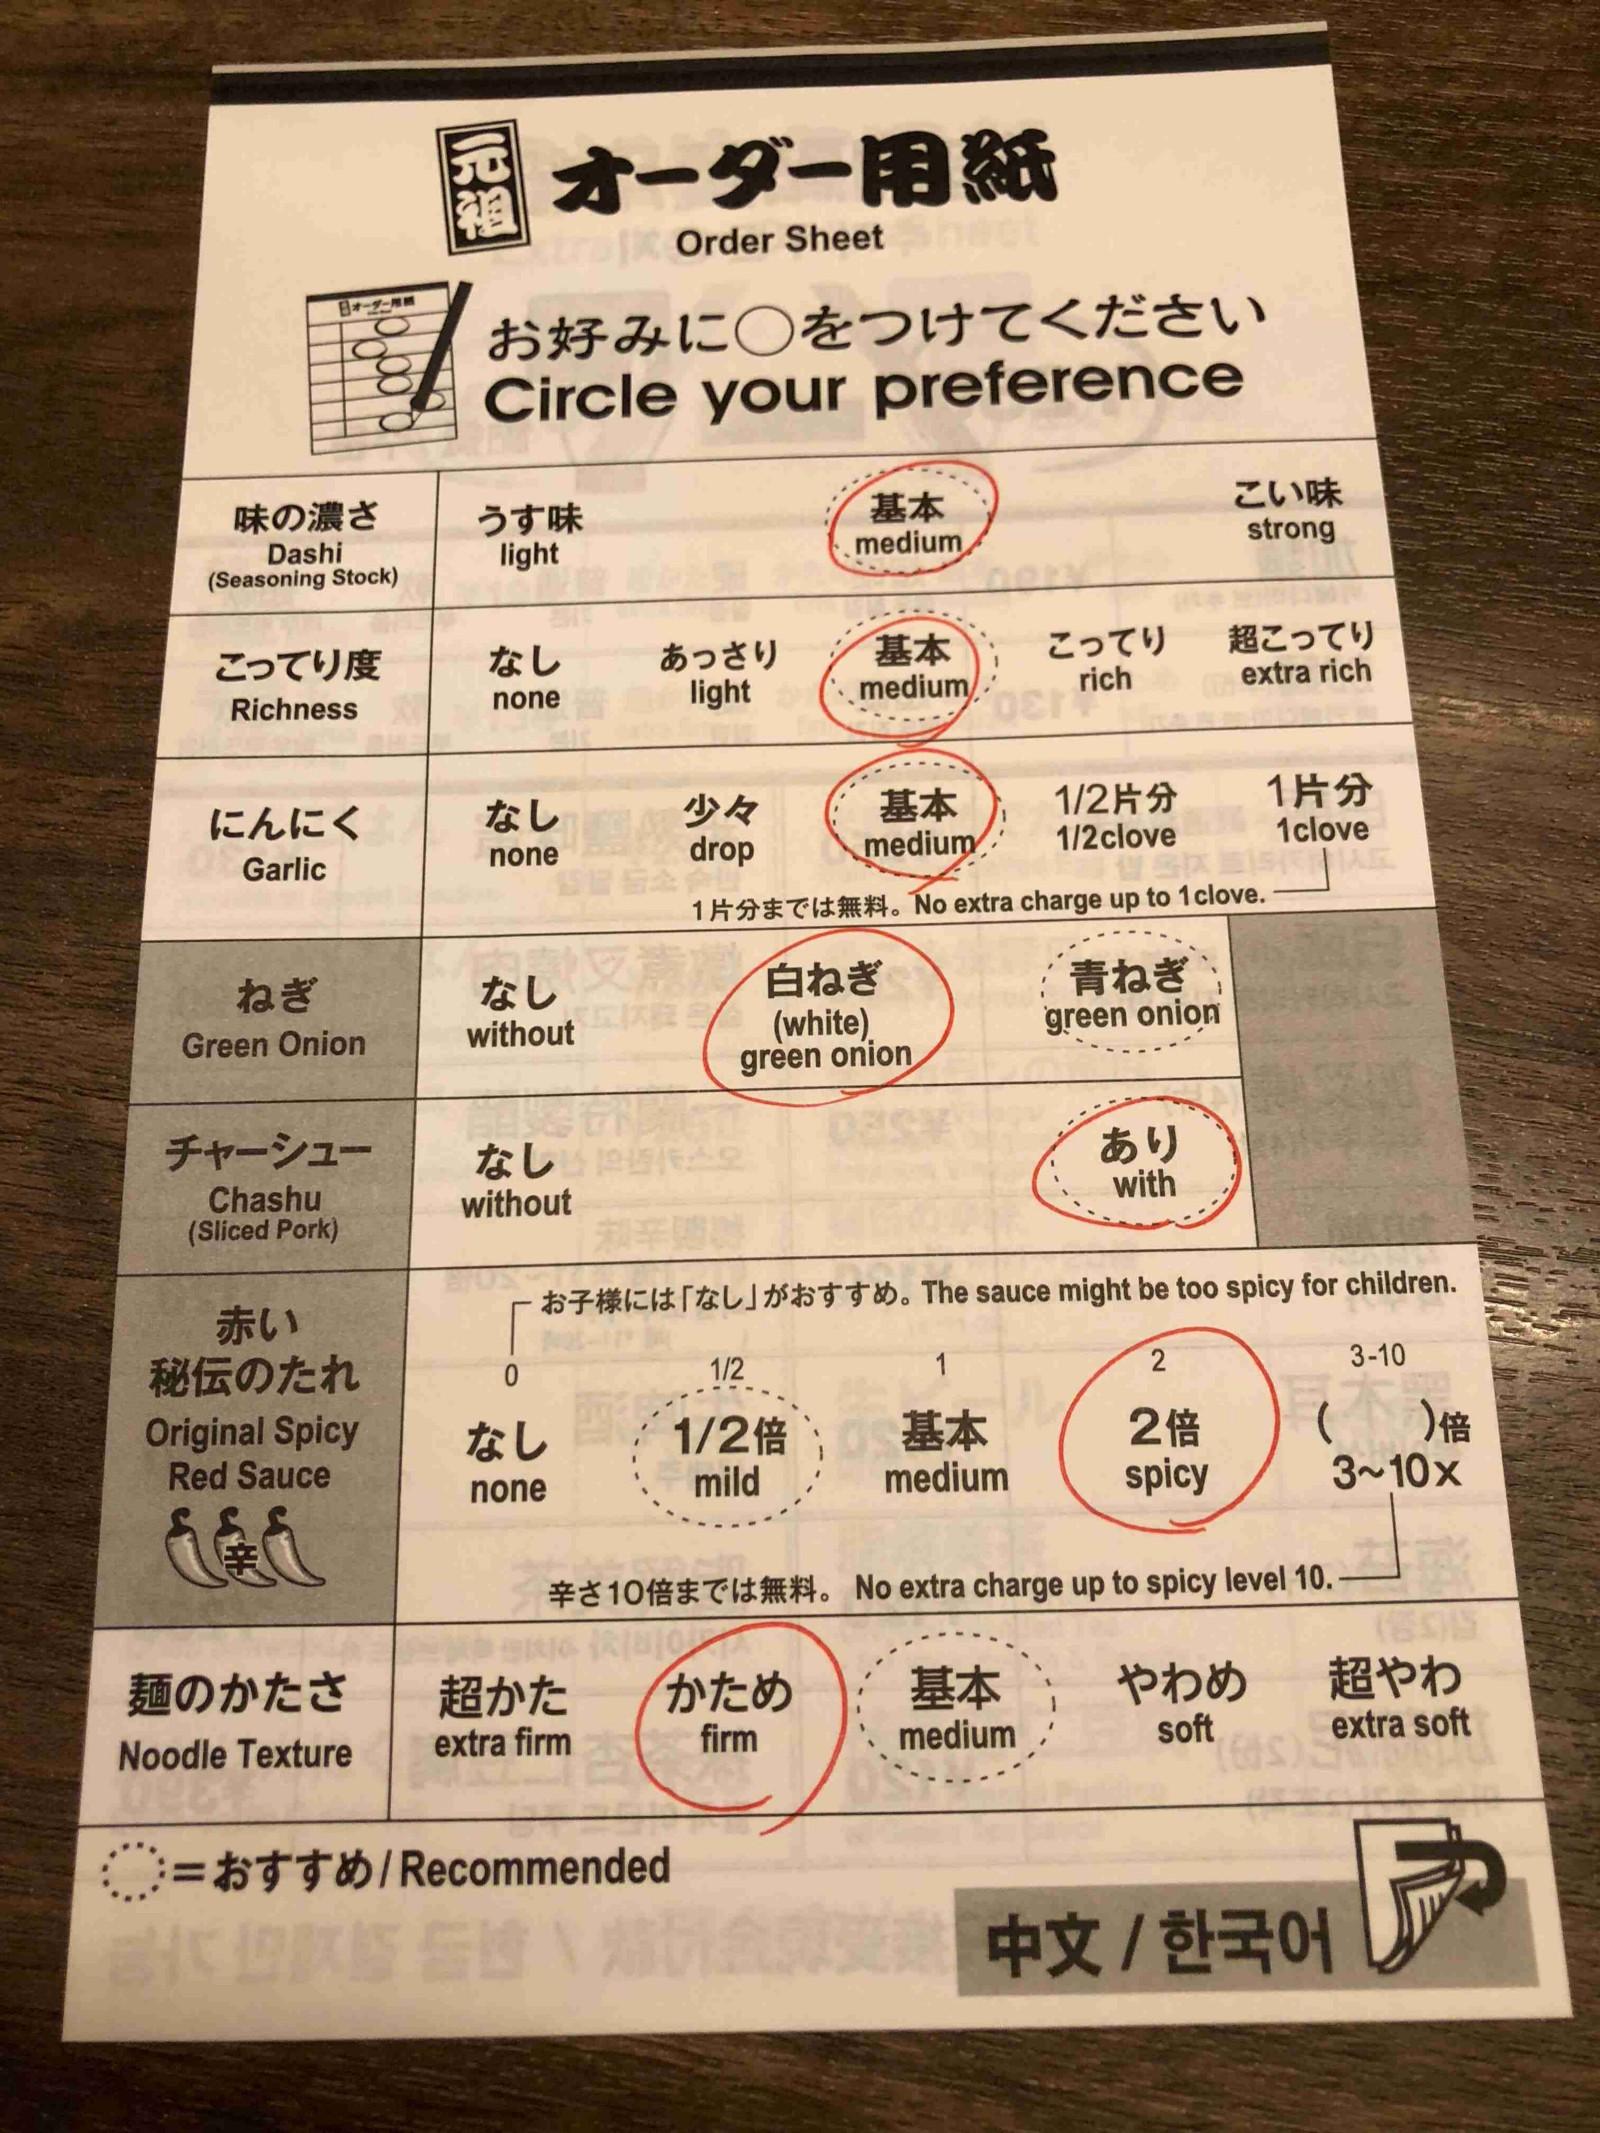 Order sheet for your ramen